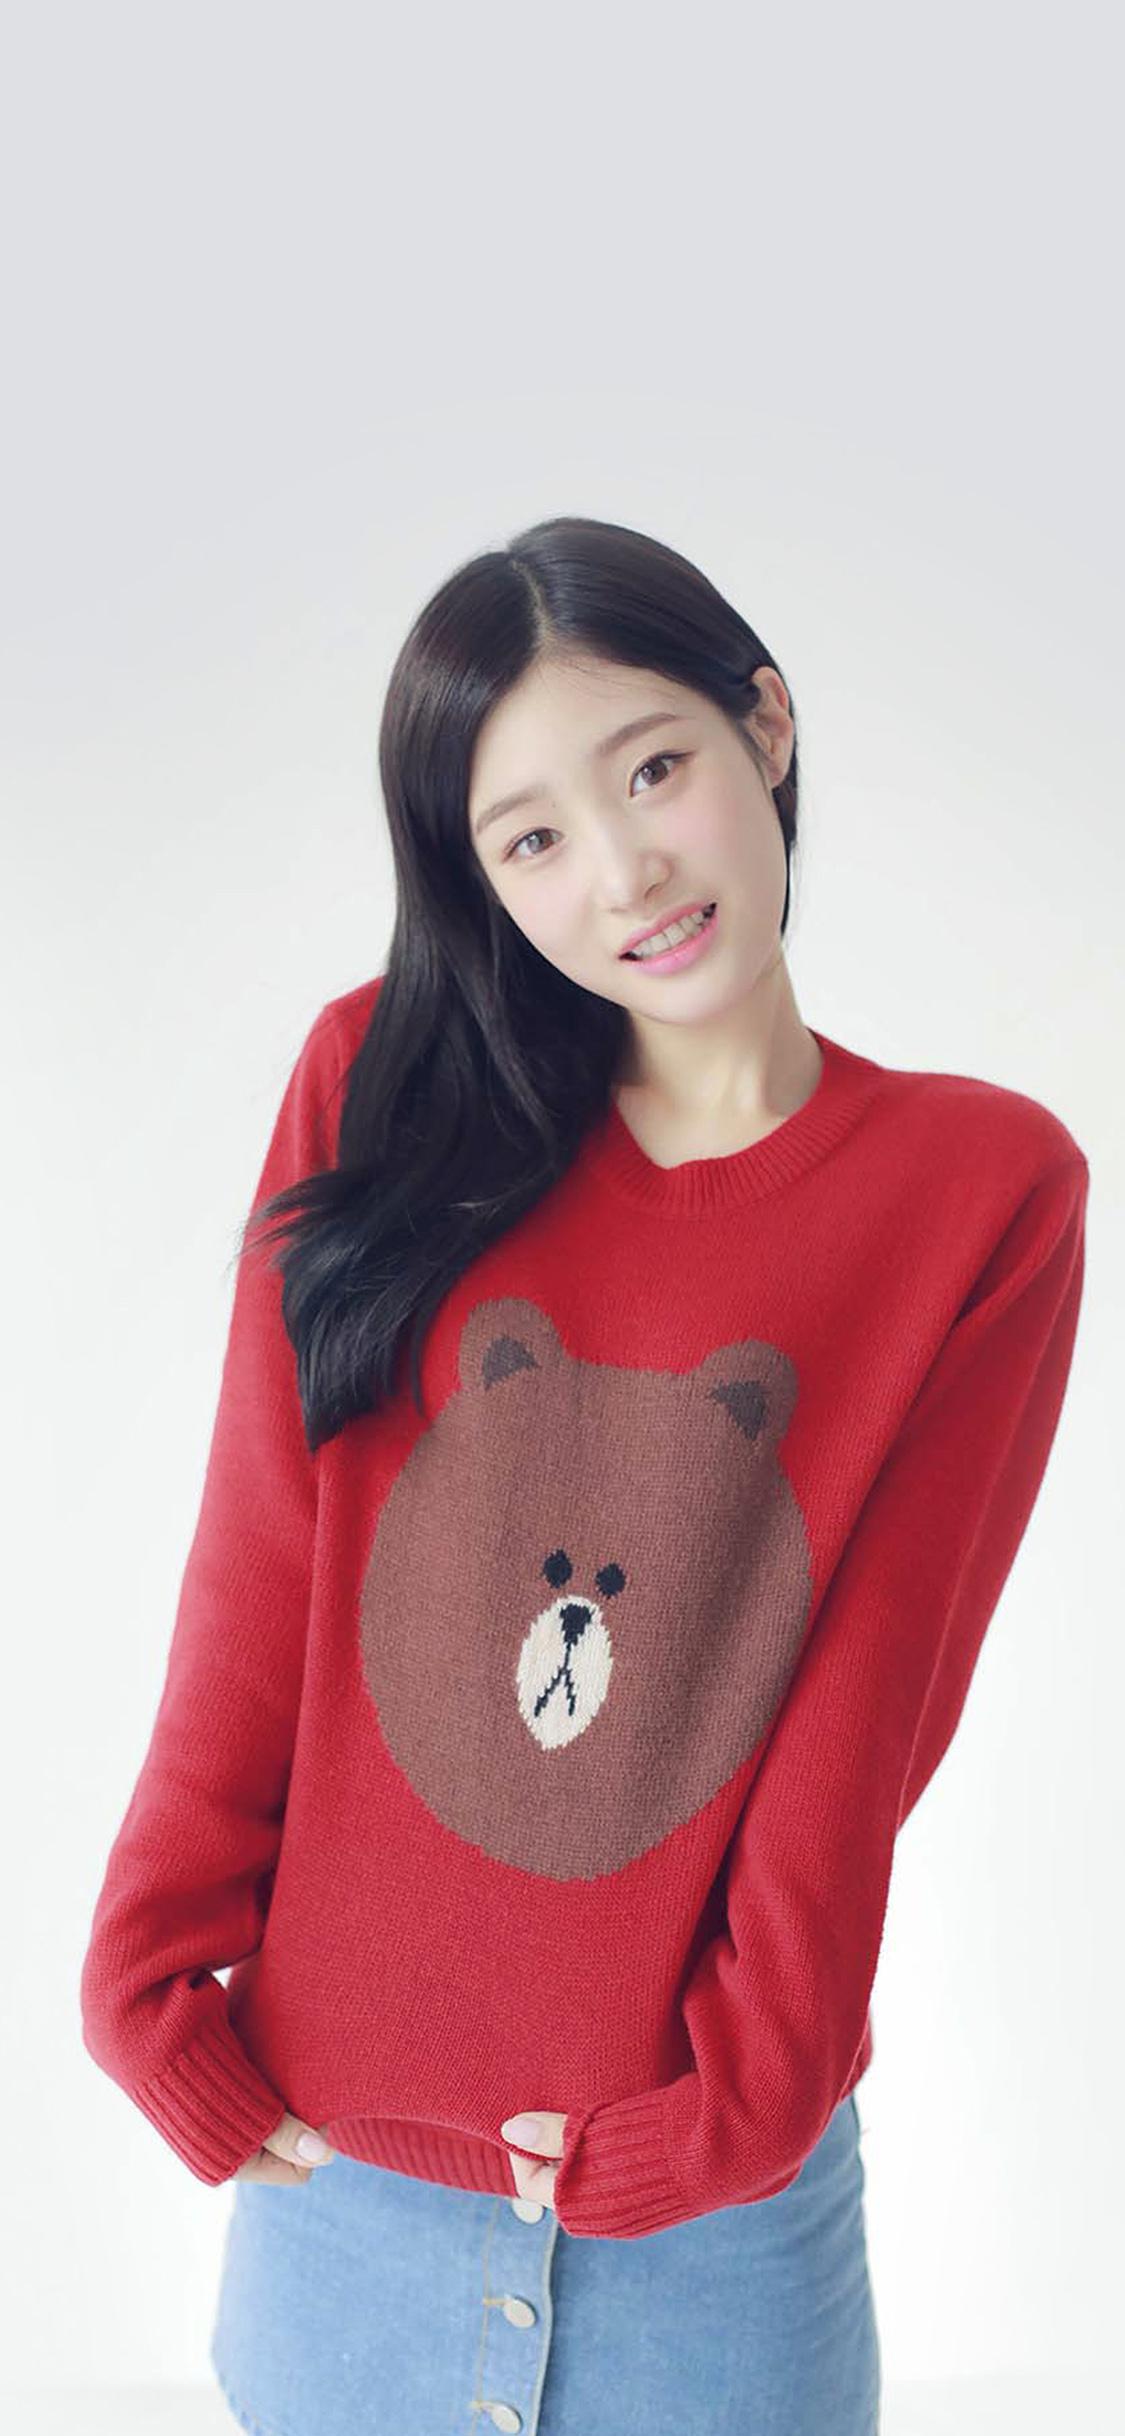 iPhoneXpapers.com-Apple-iPhone-wallpaper-hm09-chaeyeon-girl-kpop-cute